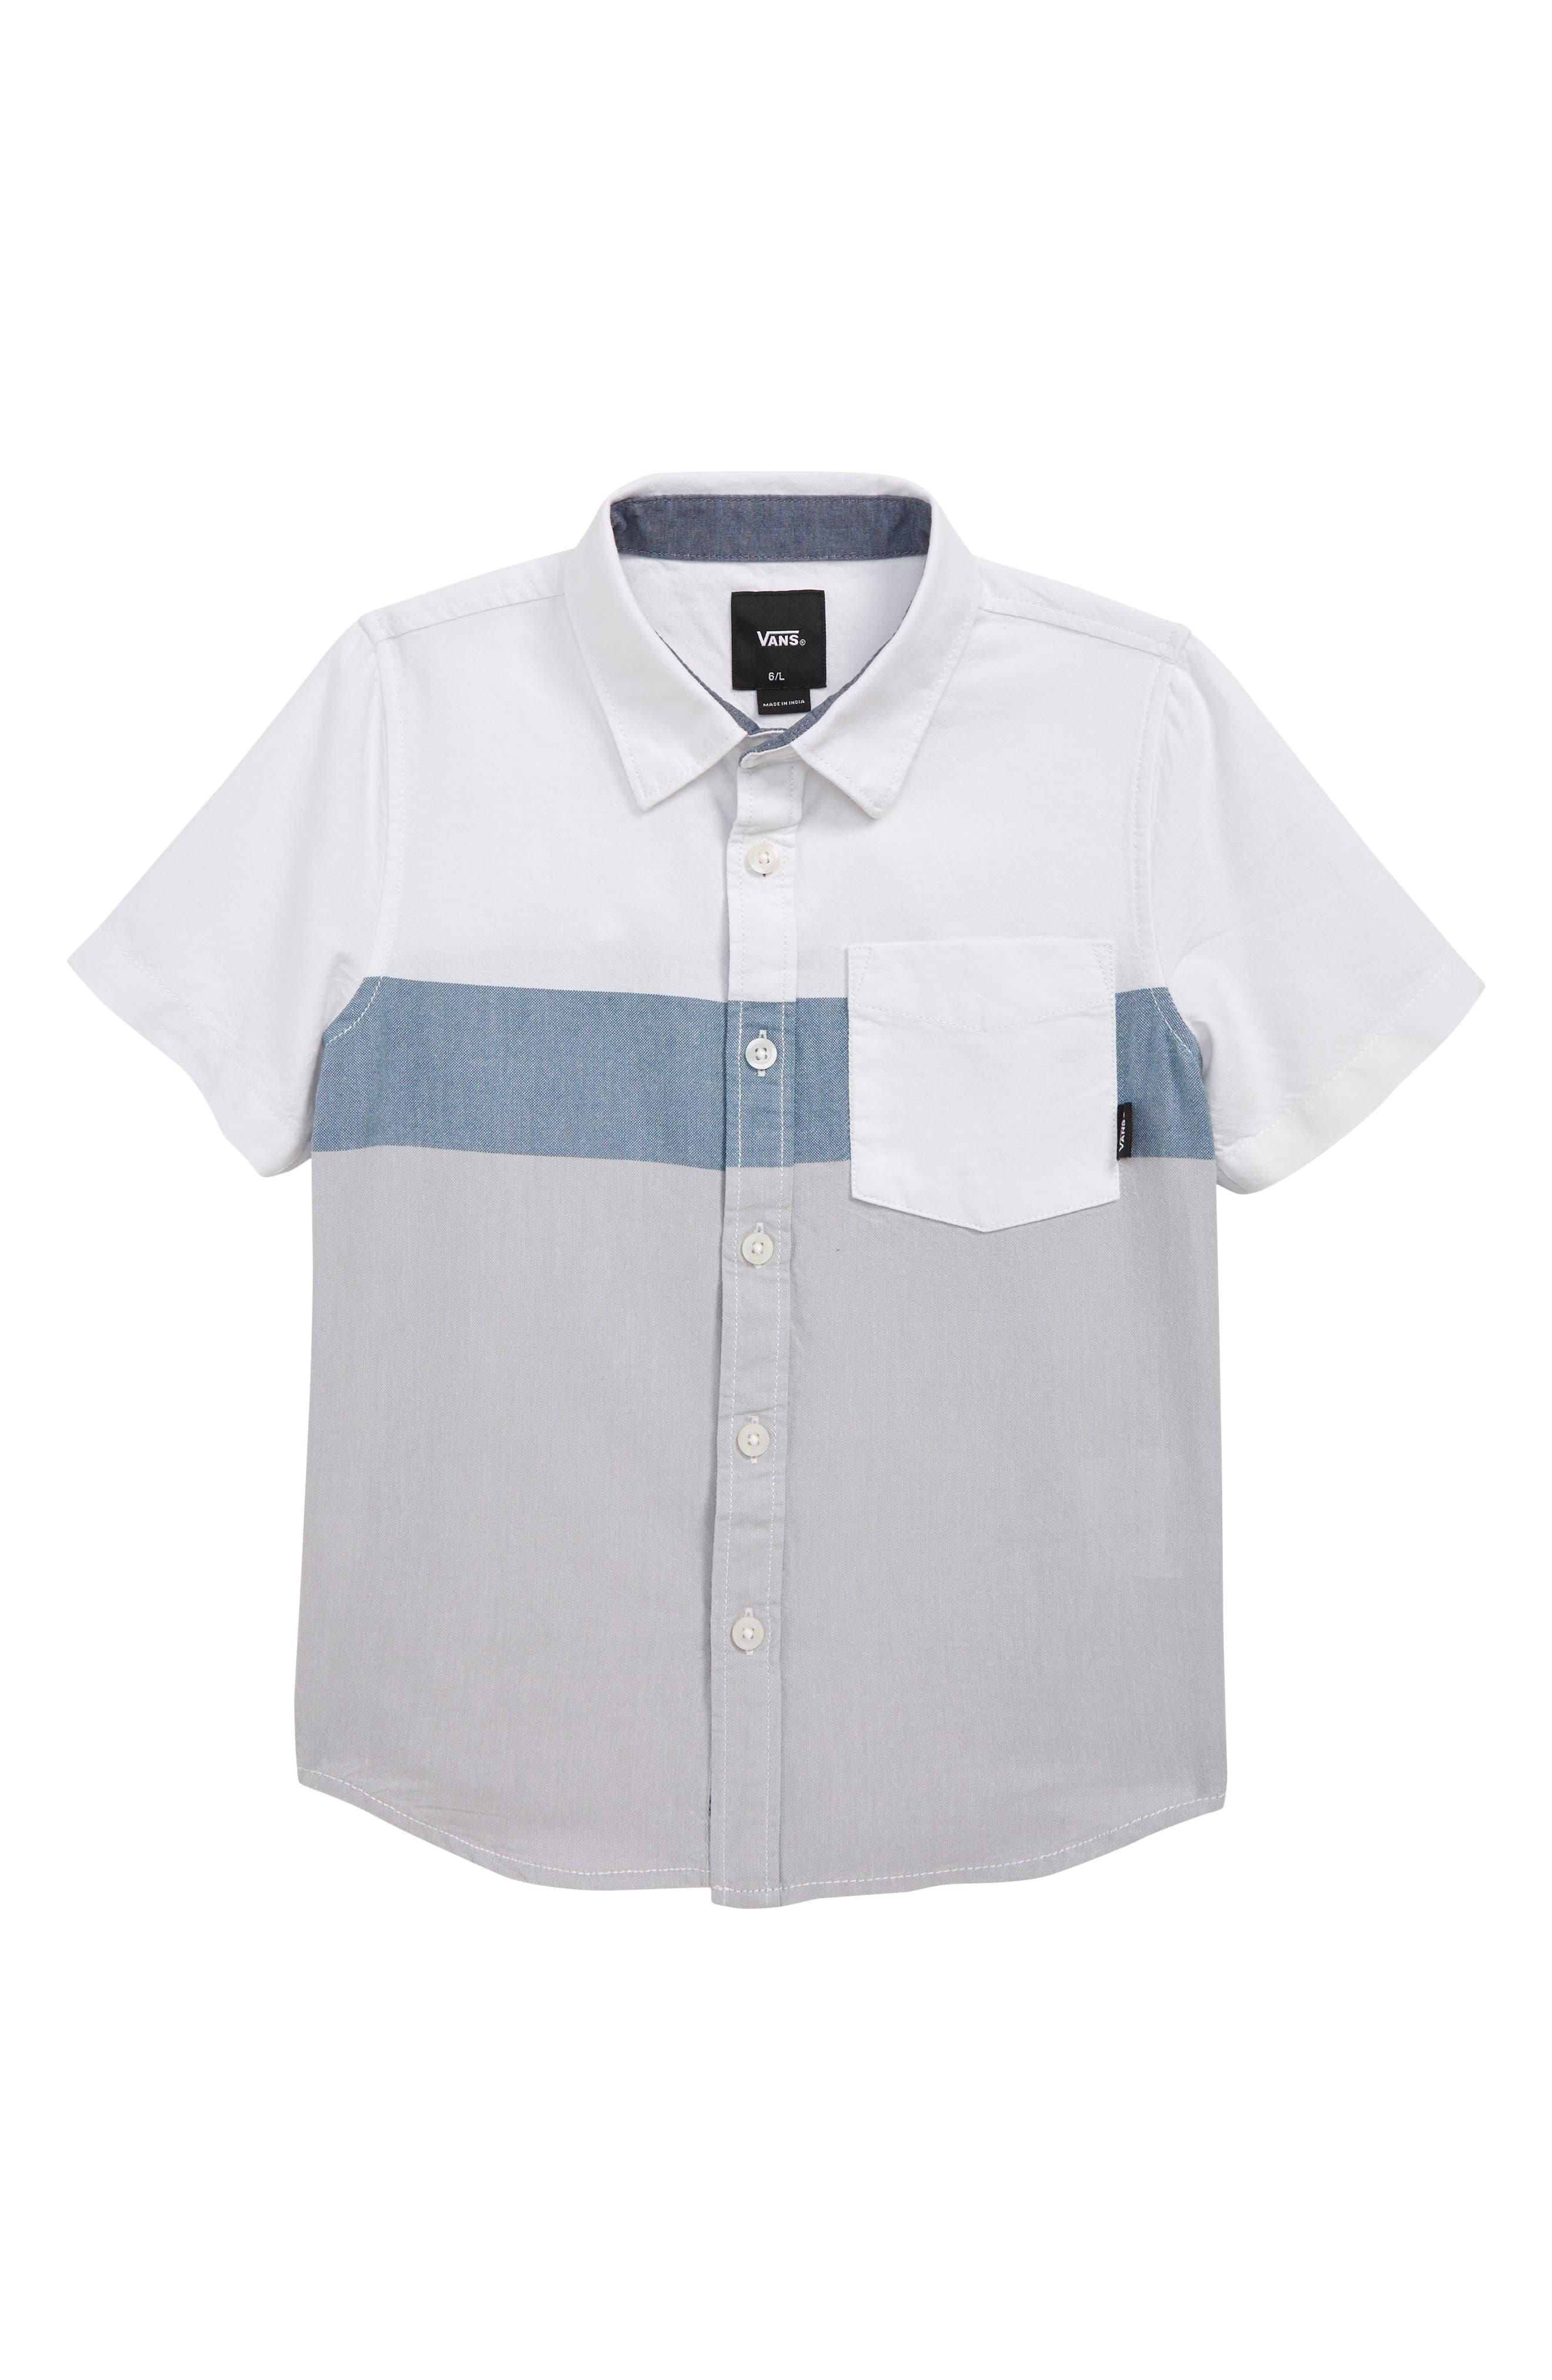 Estancia Woven Sport Shirt, Main, color, WHITE/ HIGH RISE